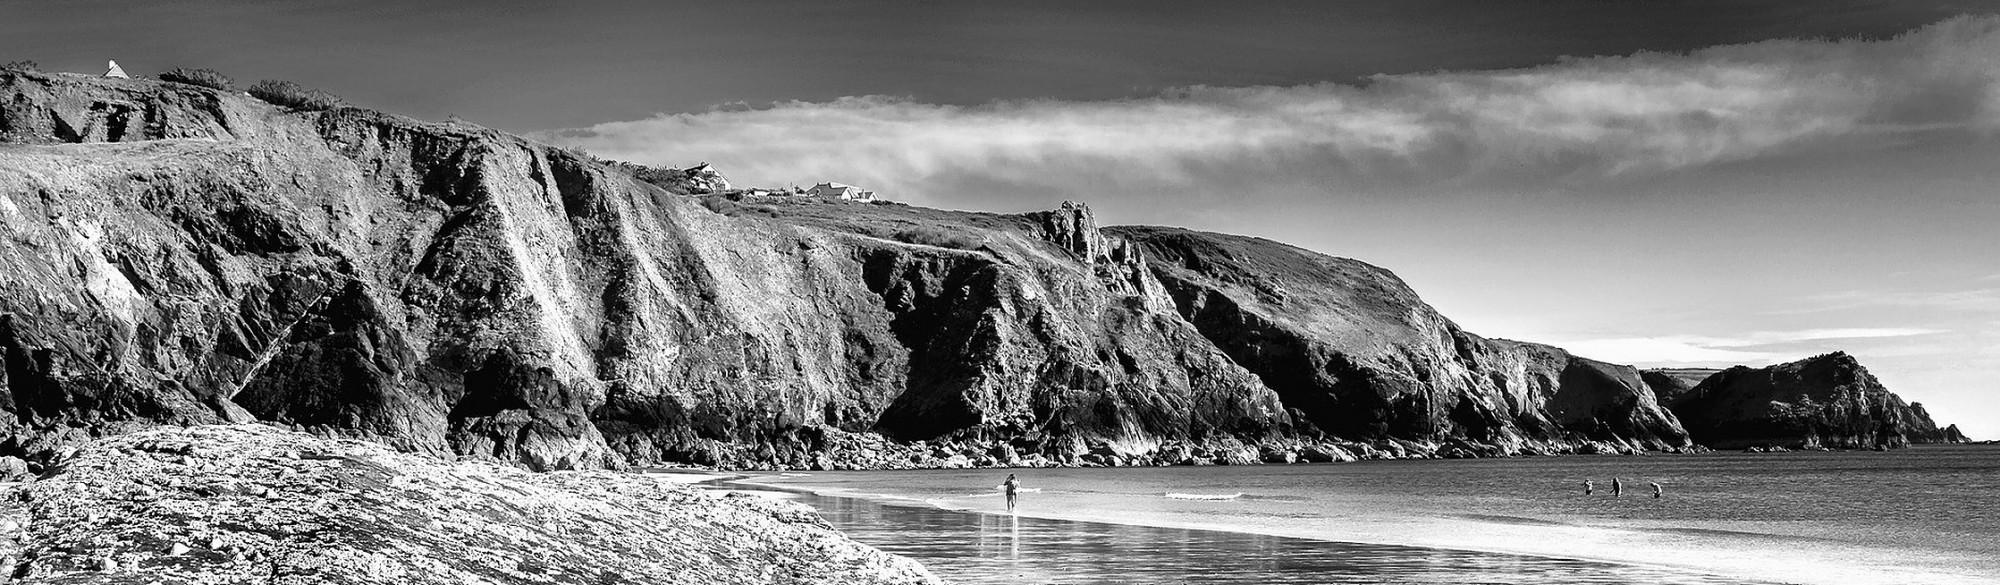 grey cliffs and beach